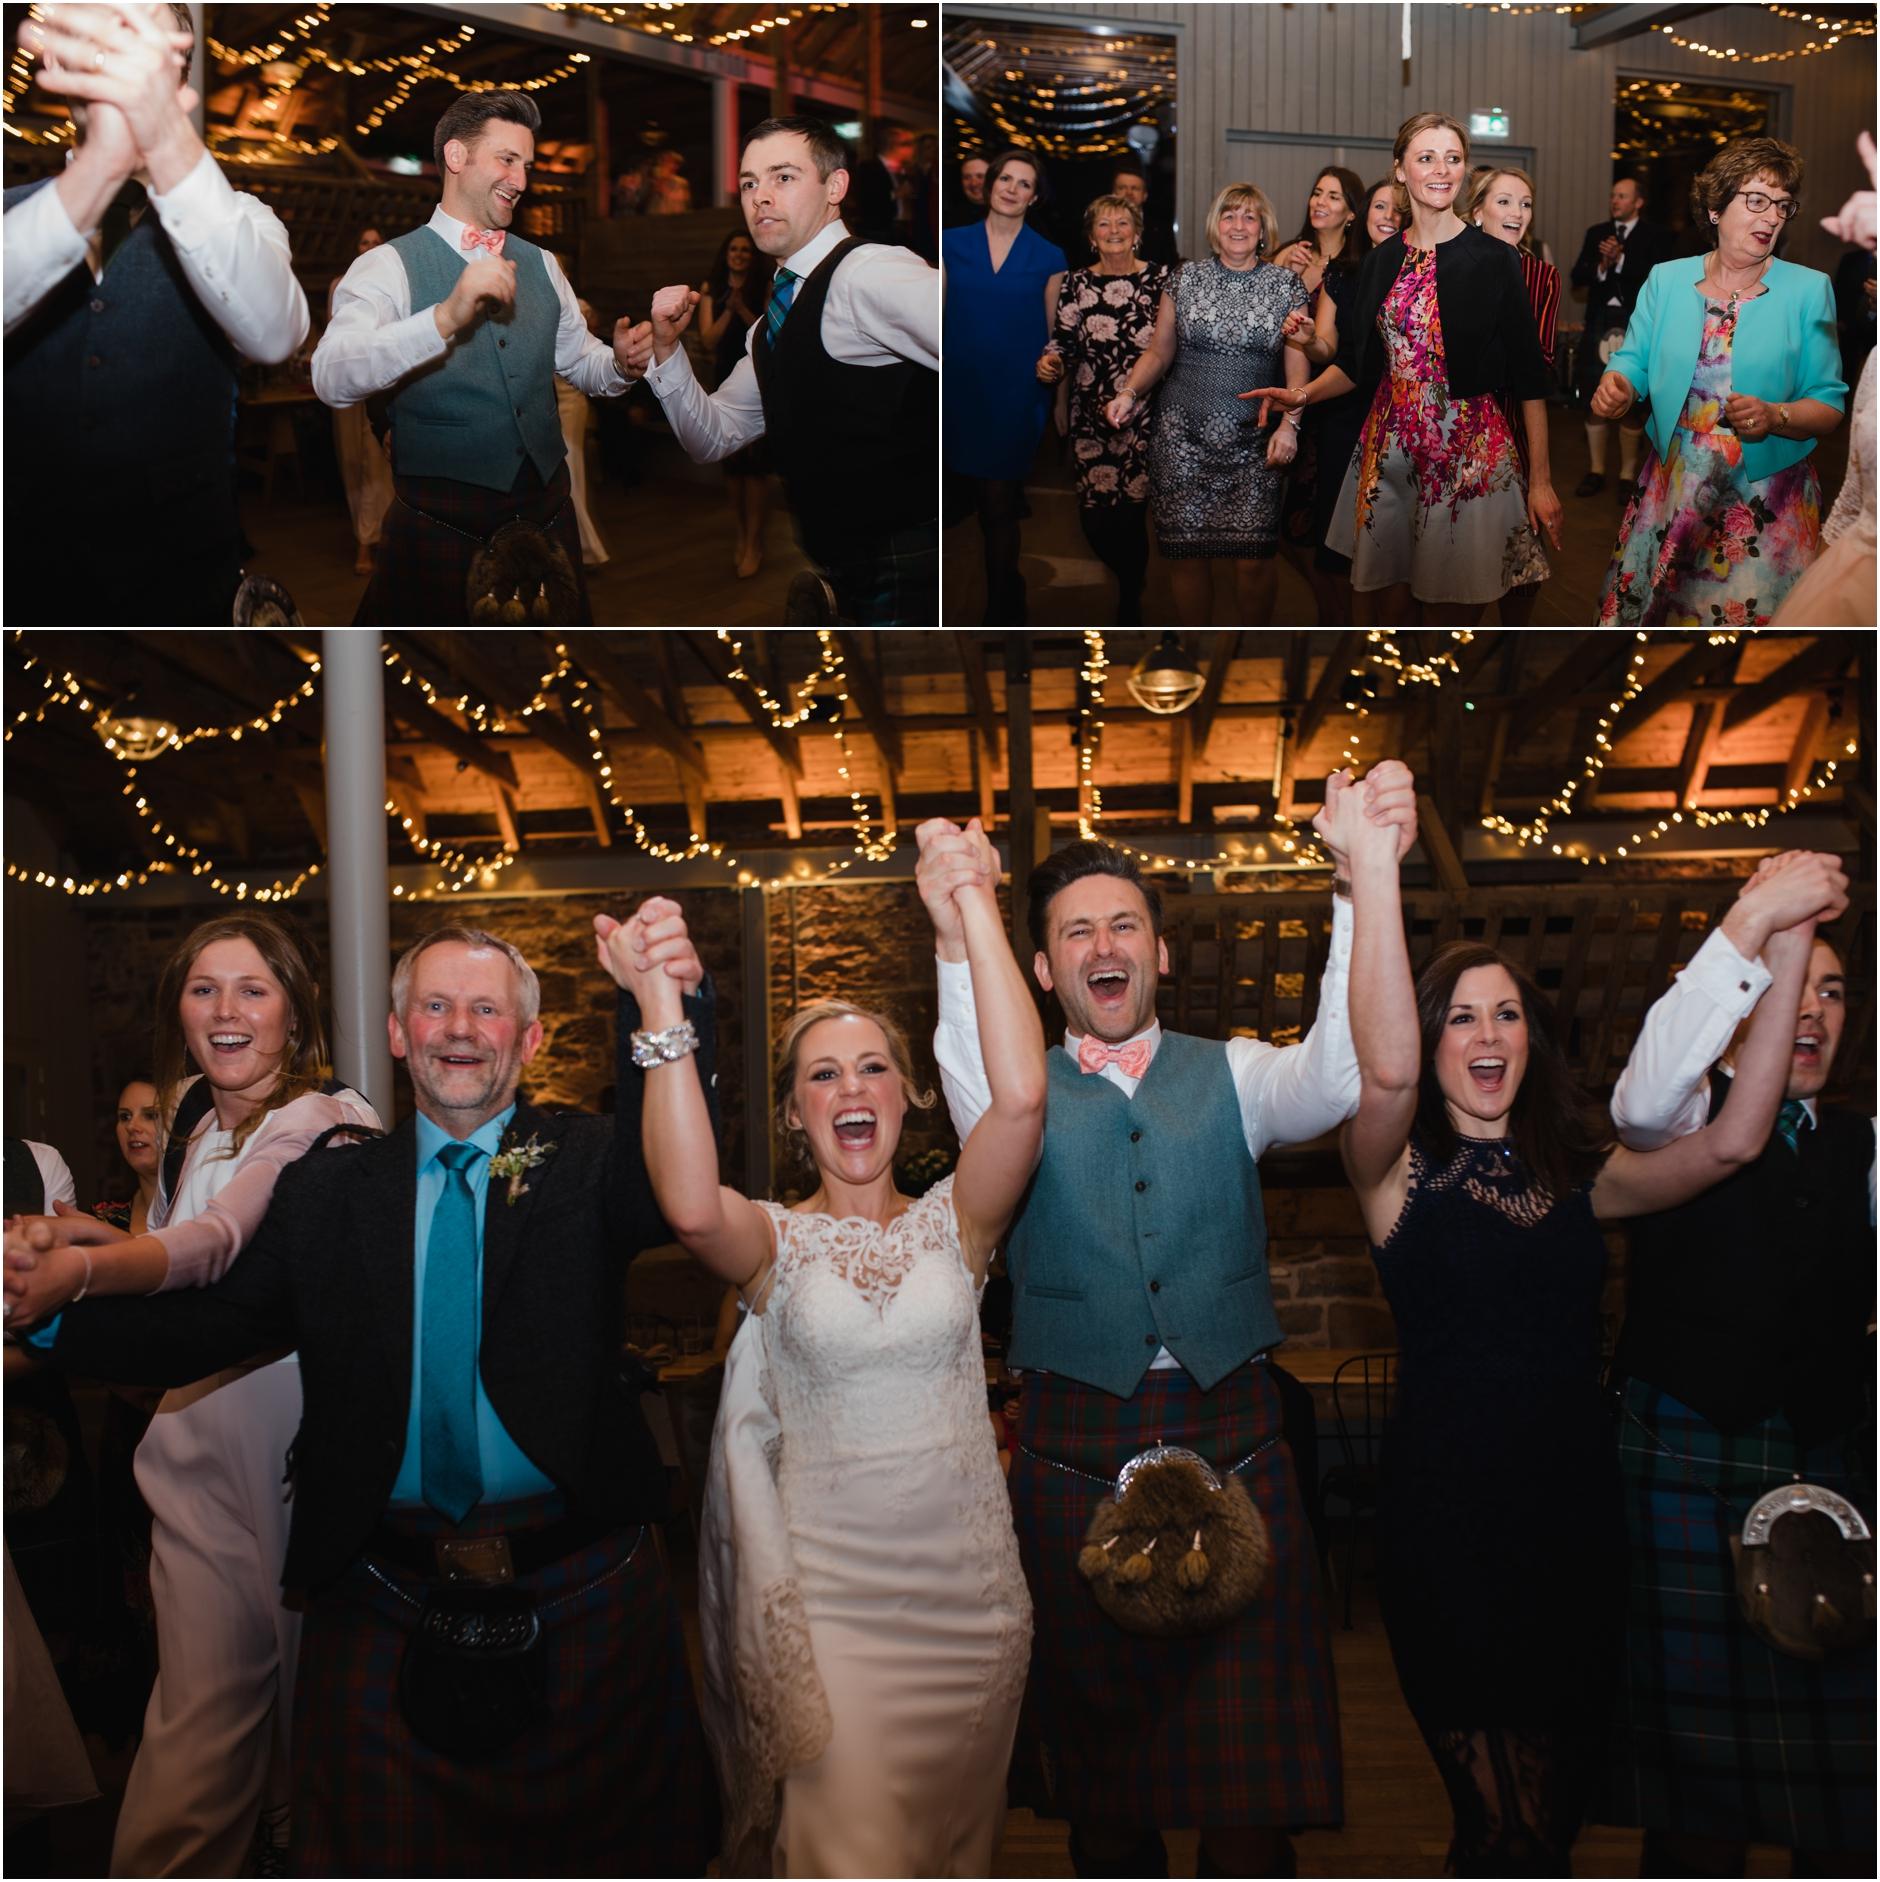 scottish ceilidh wedding photos